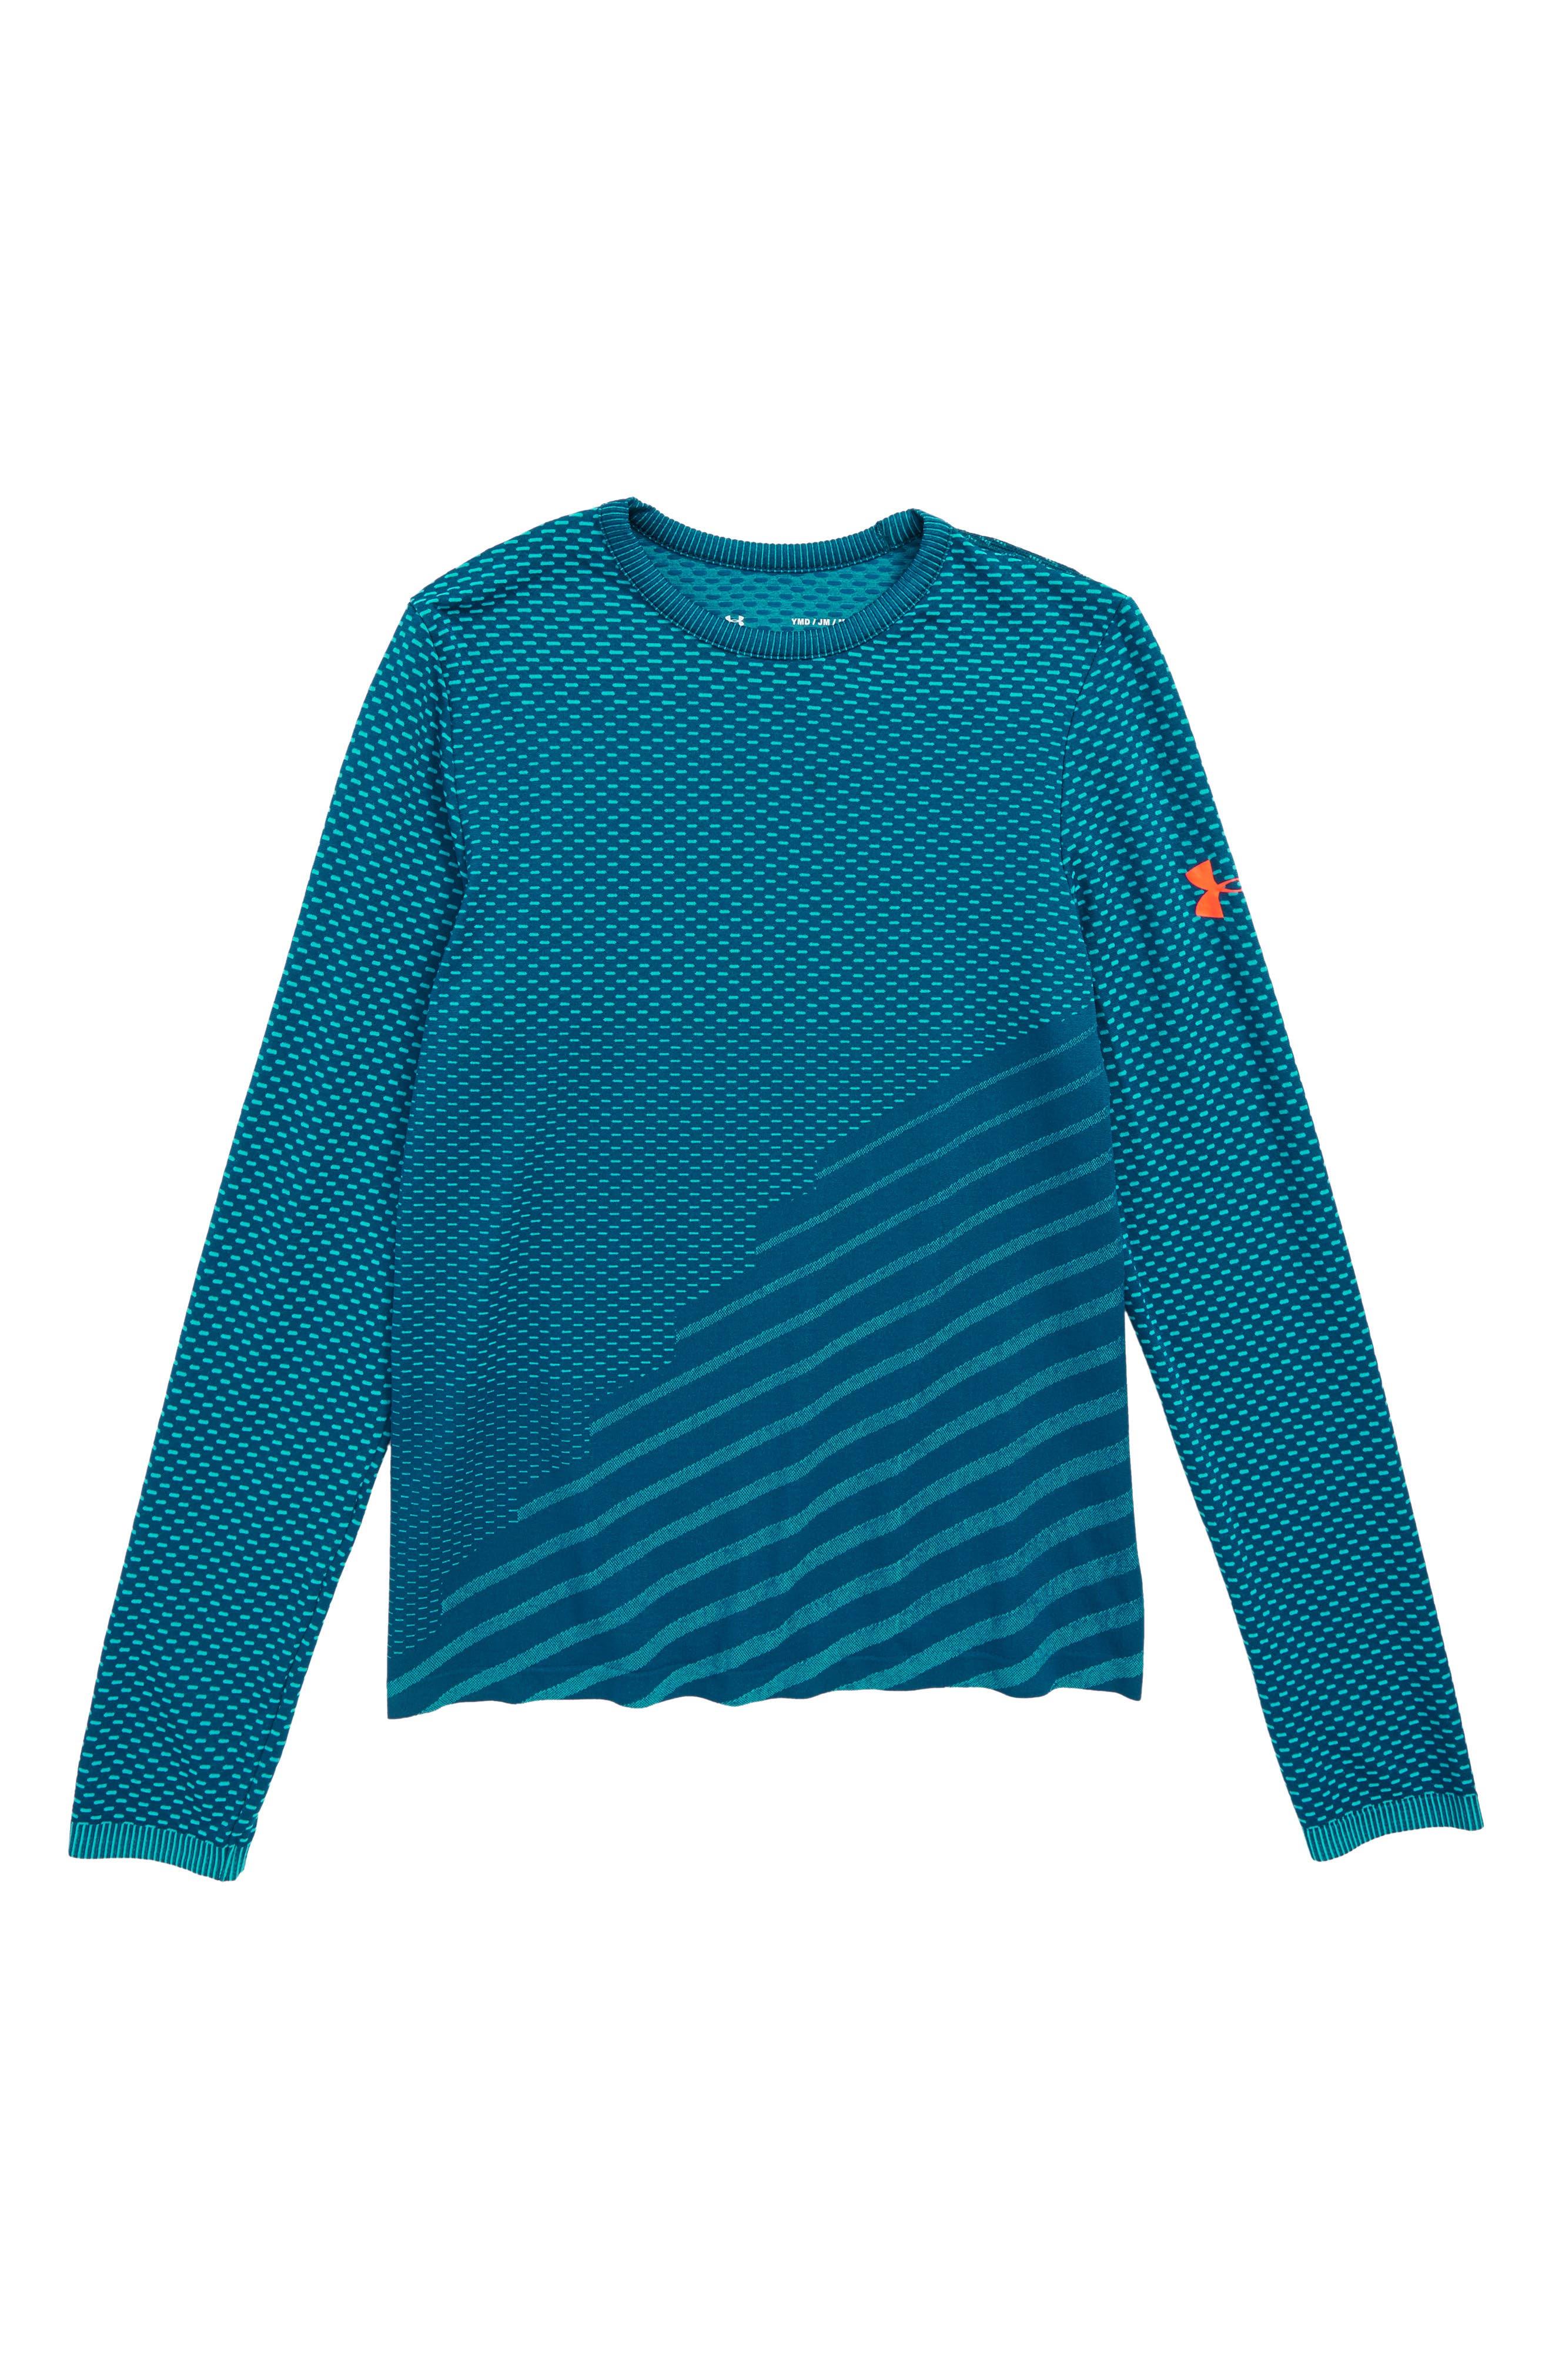 Seamless HeatGear<sup>®</sup> Shirt,                             Main thumbnail 1, color,                             TECHNO TEAL